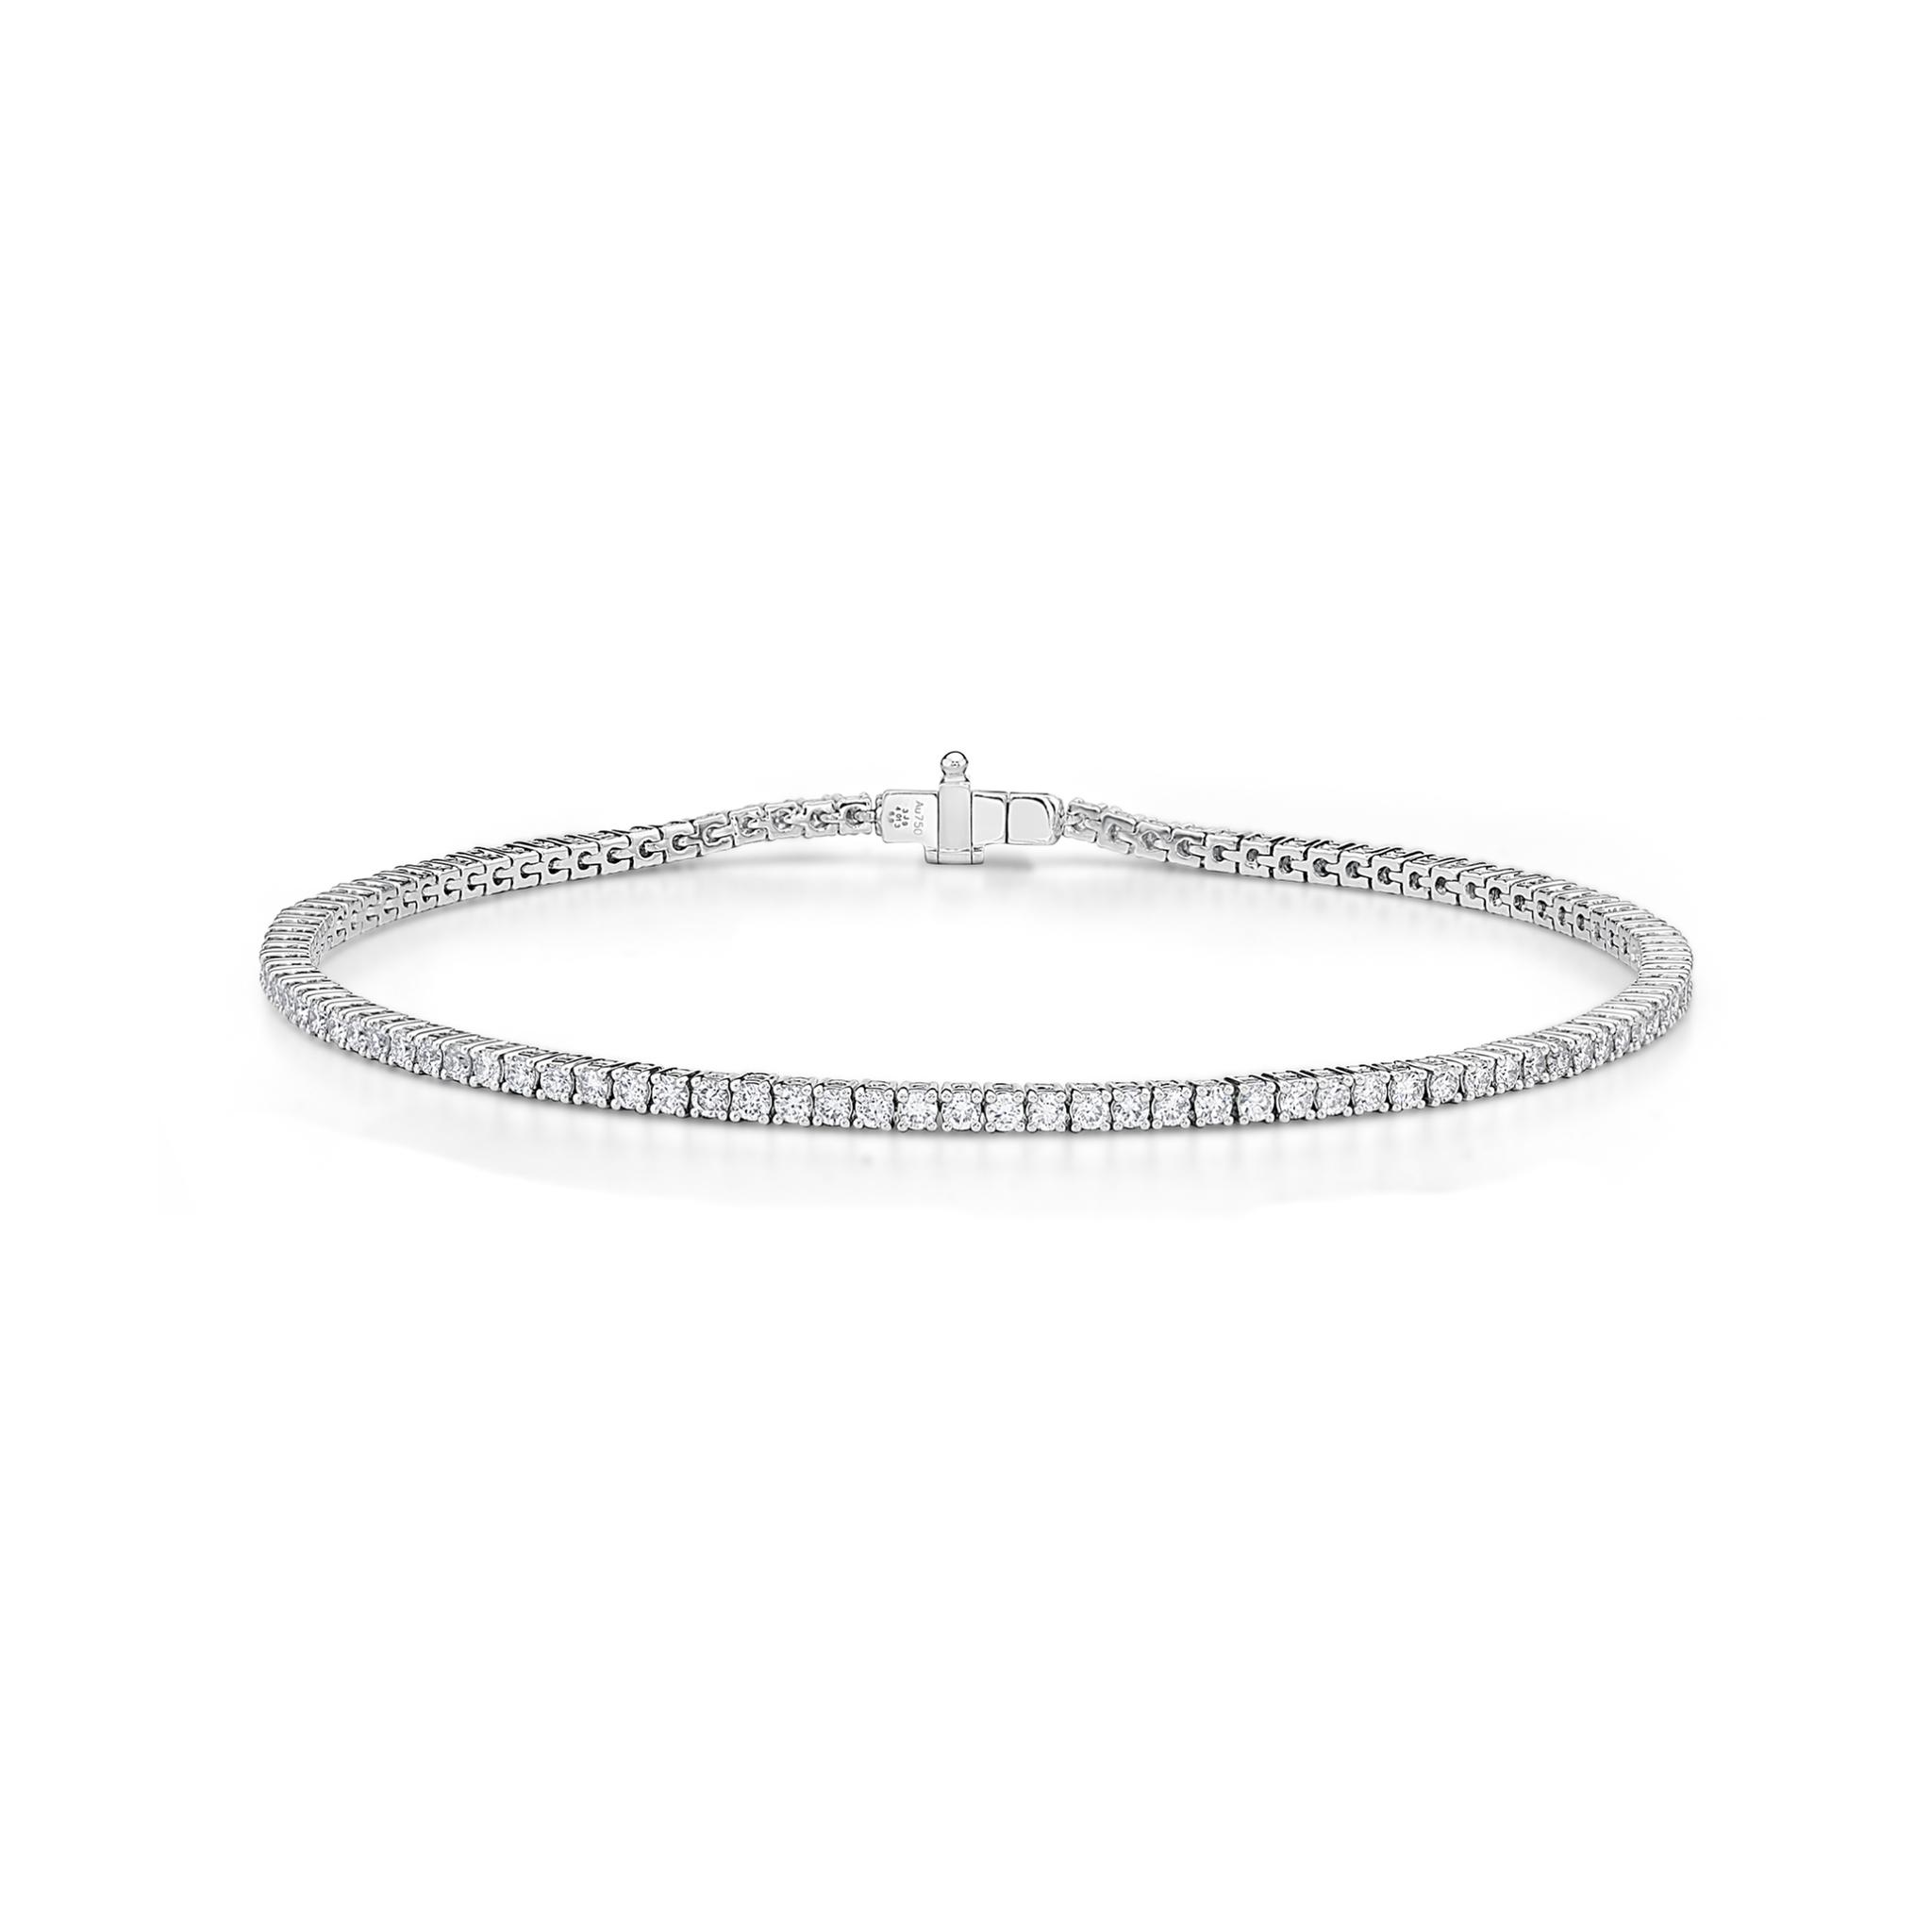 Memoire 18ct White Gold 2 Carat Diamond 4 Prong Tennis Bracelet